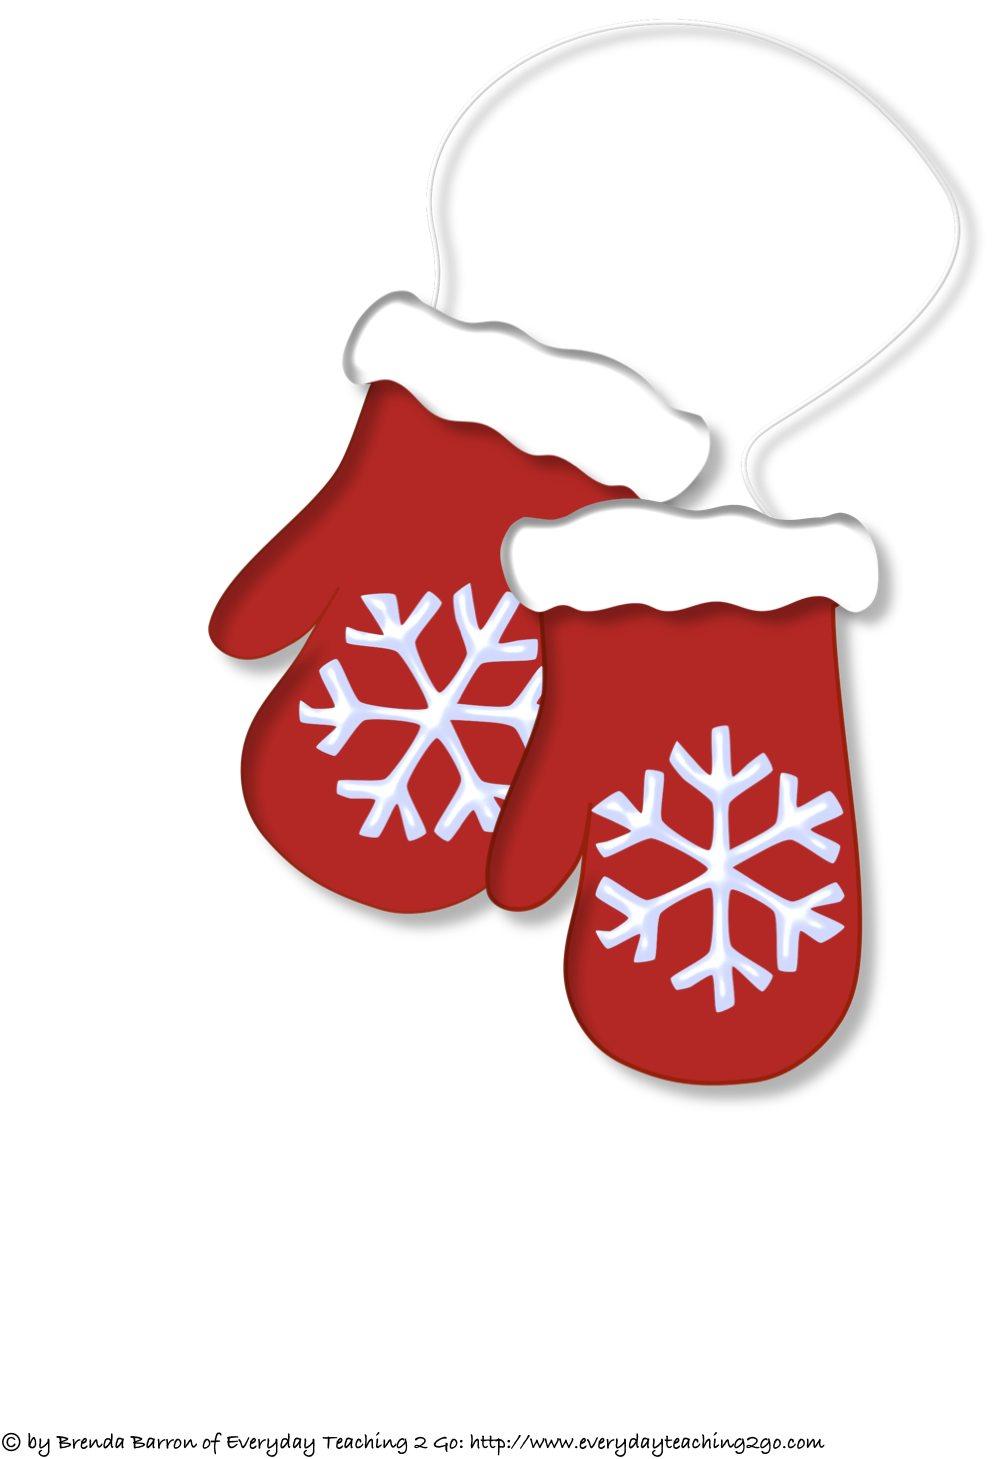 Christmas mittens clipart – Gclipart.com